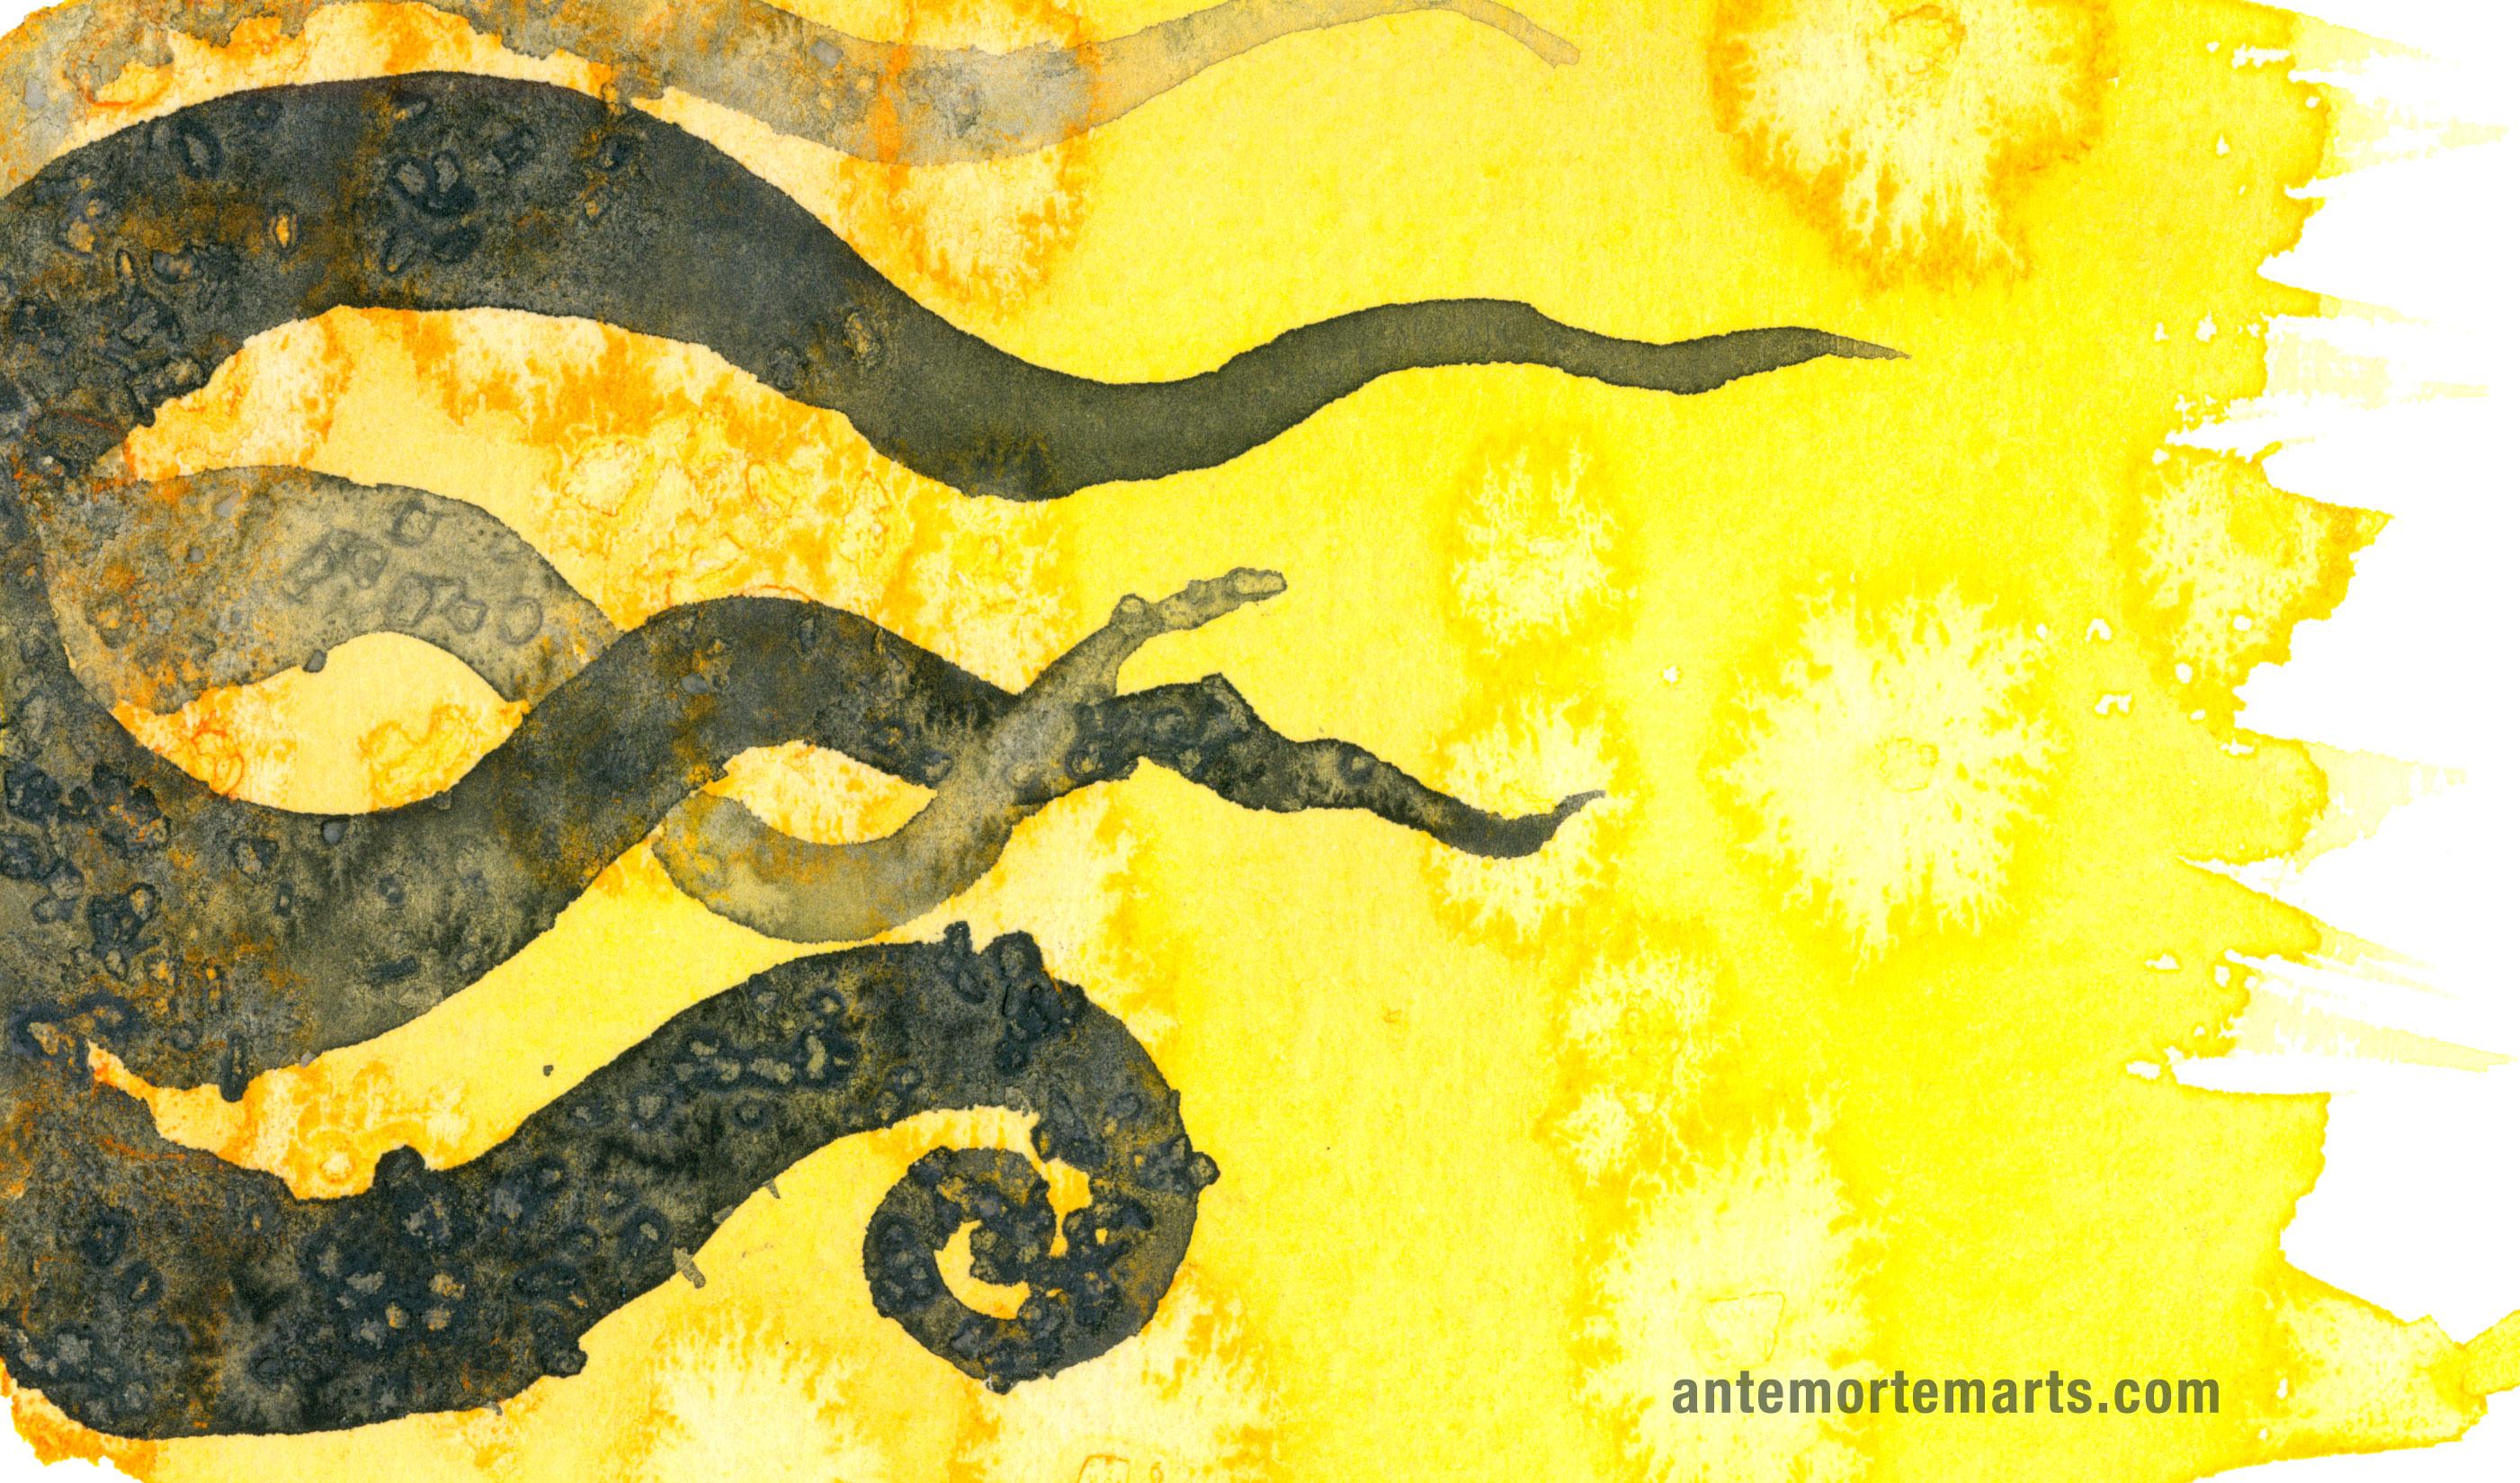 Gold Wallpaper Iphone 4 Tentacle Deeps 9 171 Antemortem Arts Fine Art Amp Custom